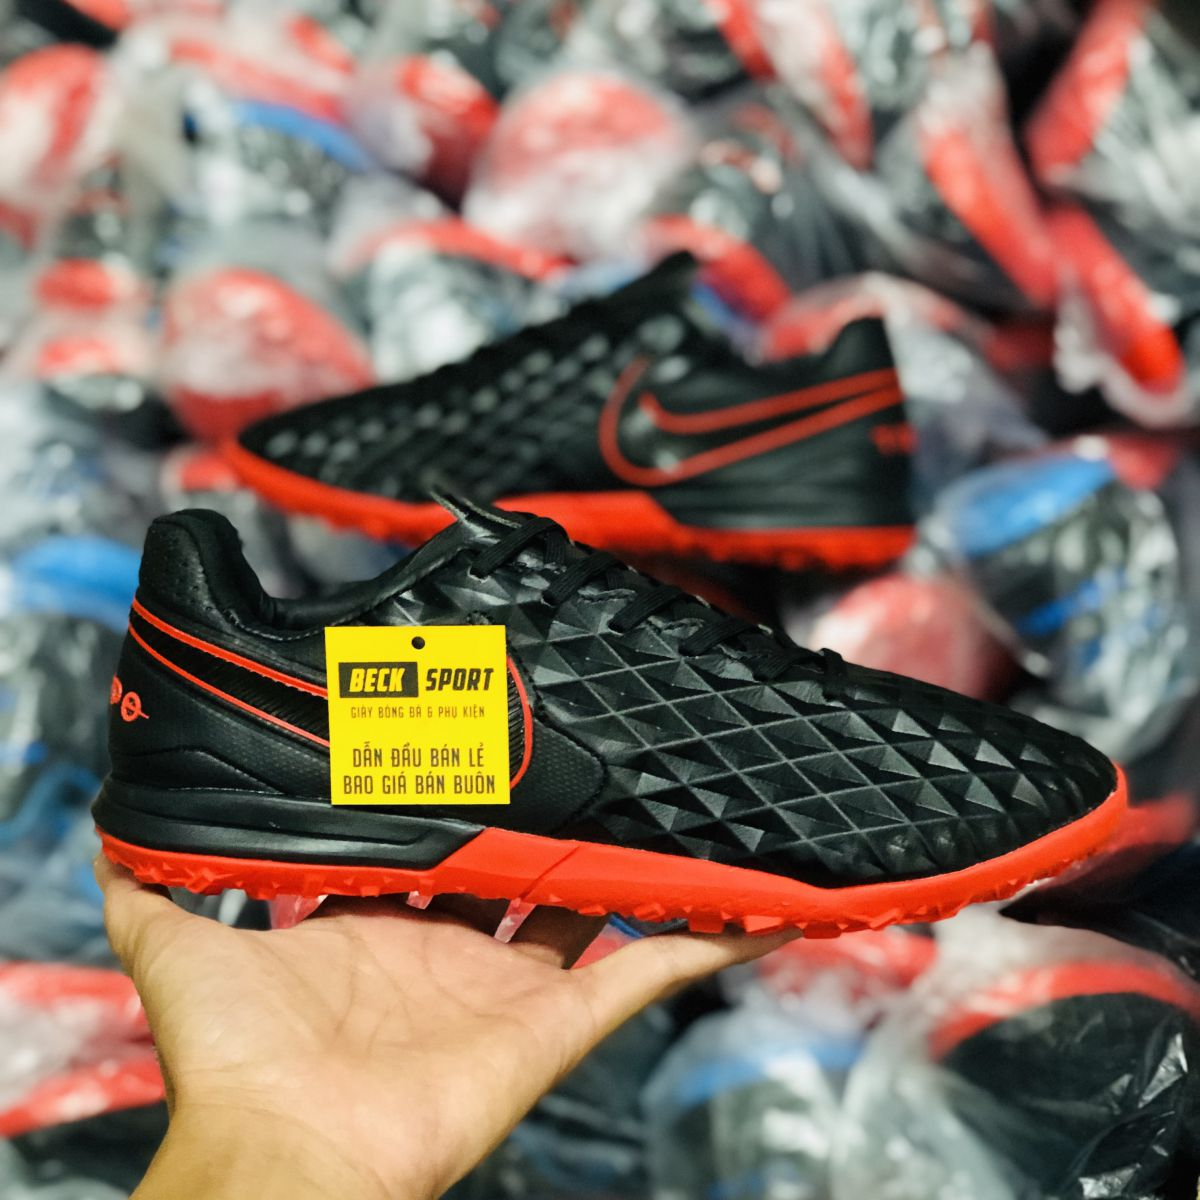 Giày Bóng Đá Nike Tiempo Legend 8 Pro Đen Đế Đỏ V2 TF